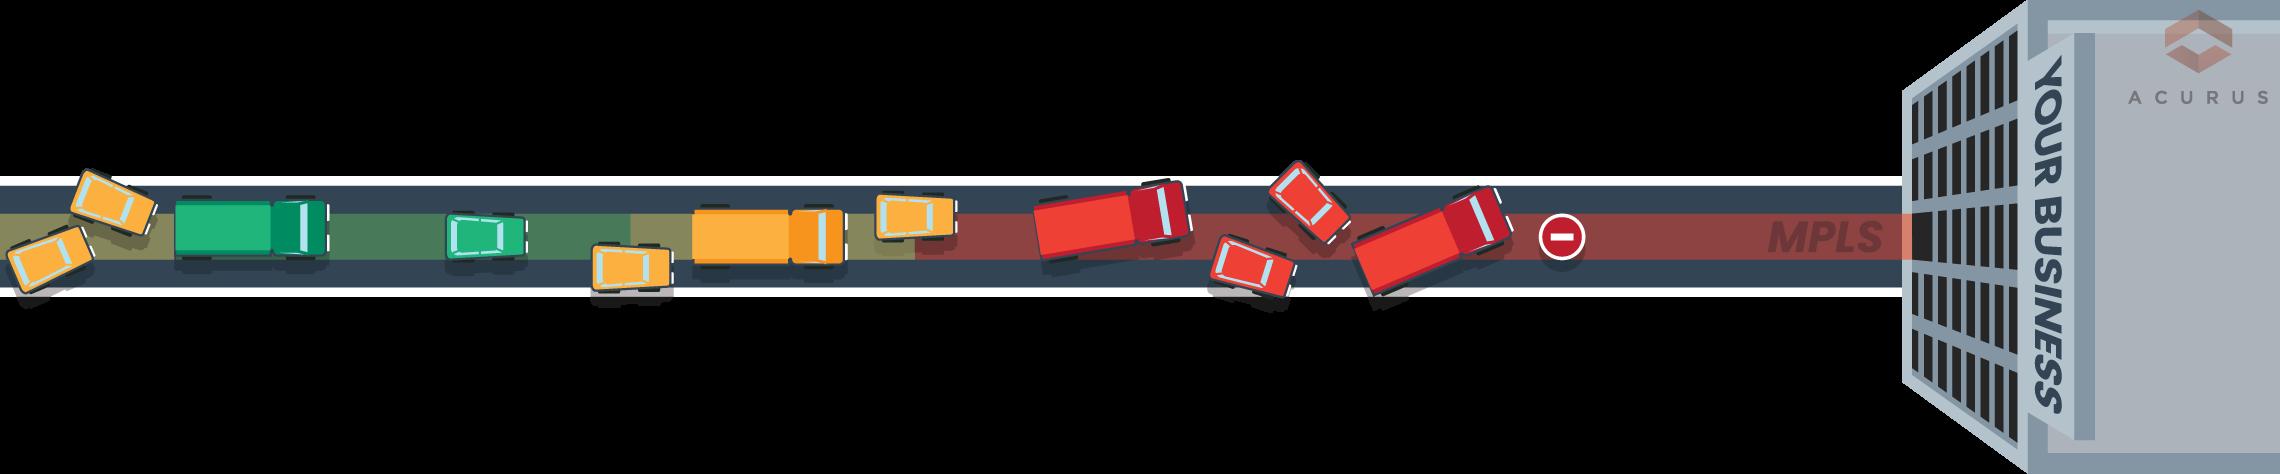 sdwan congested lane